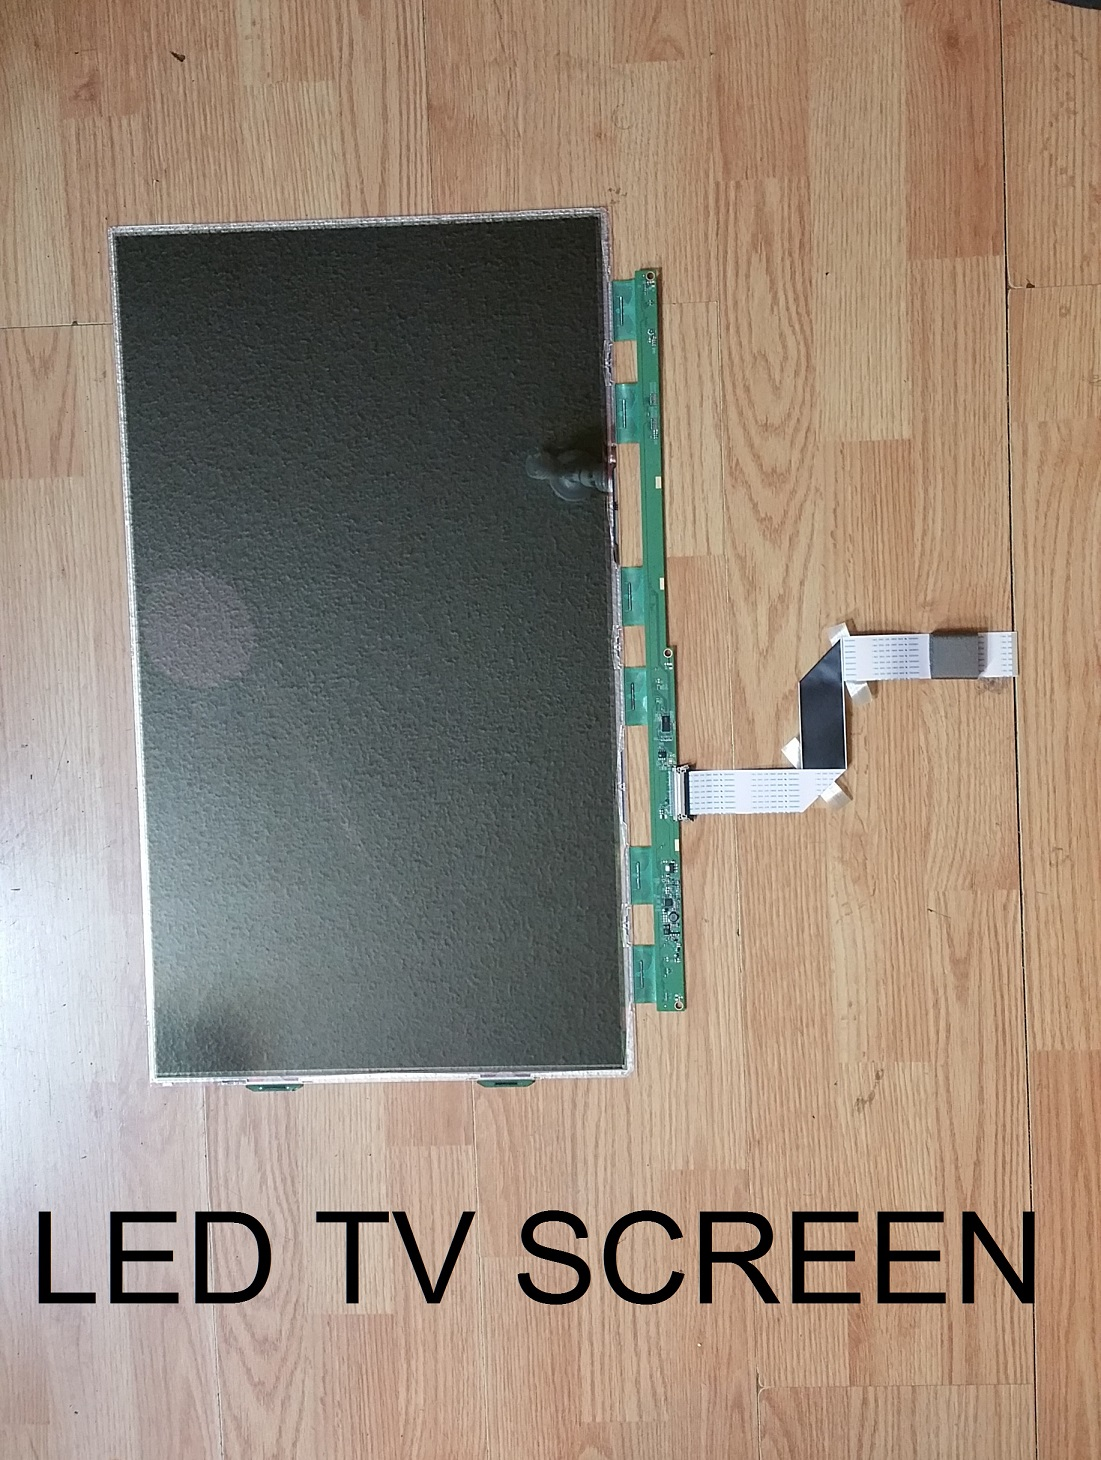 Cracked Screen TV, Damaged Screen TV, Recycle Program